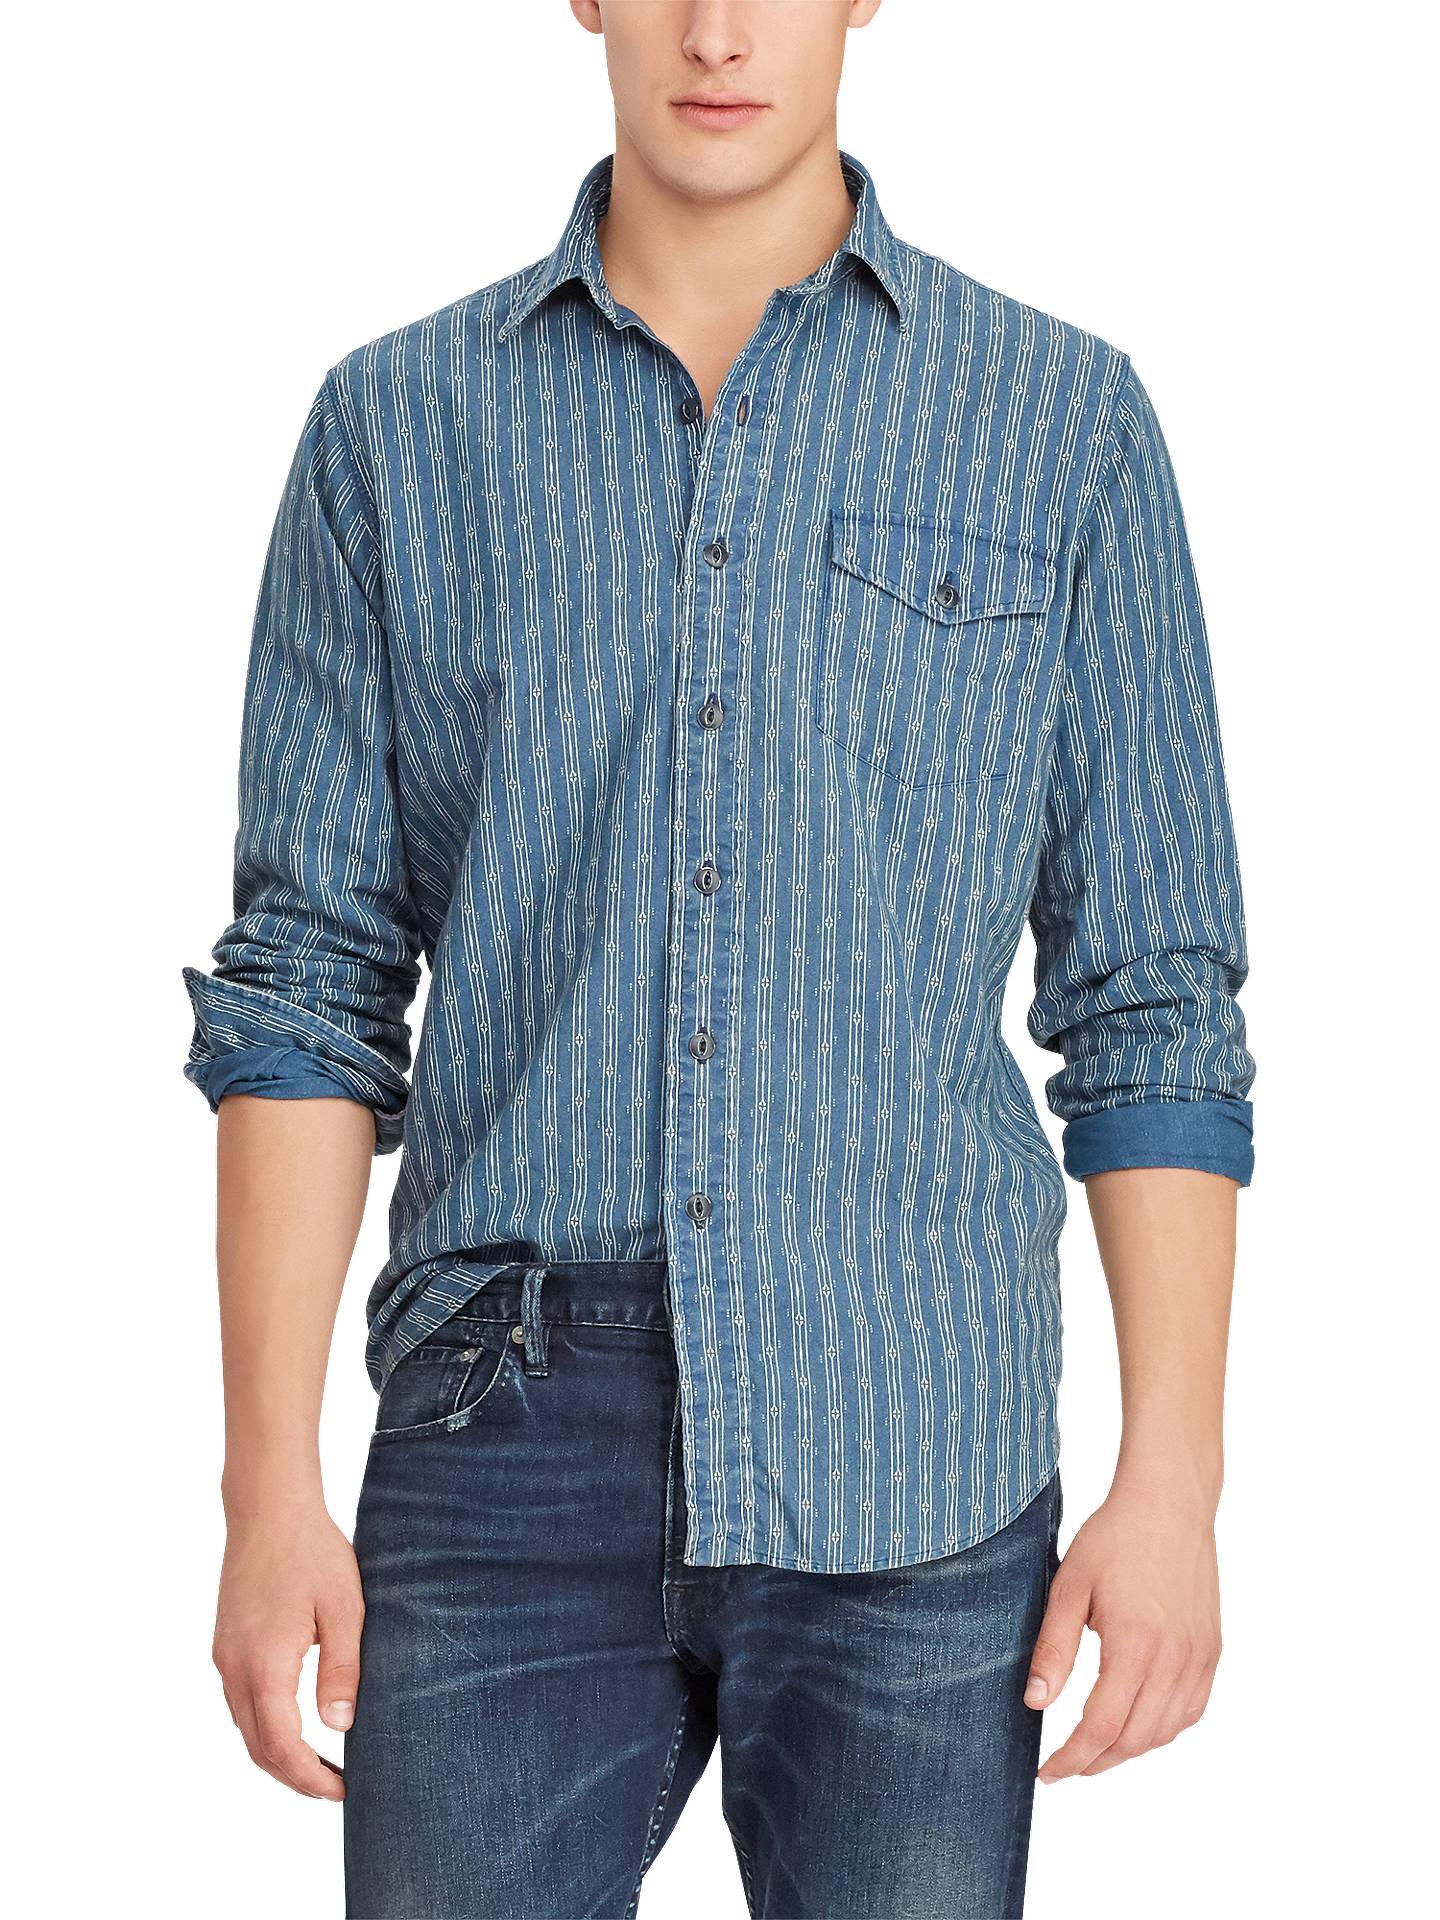 2de04cfa8a Buy Polo Ralph Lauren Long Sleeve Classic Fit Sport Shirt